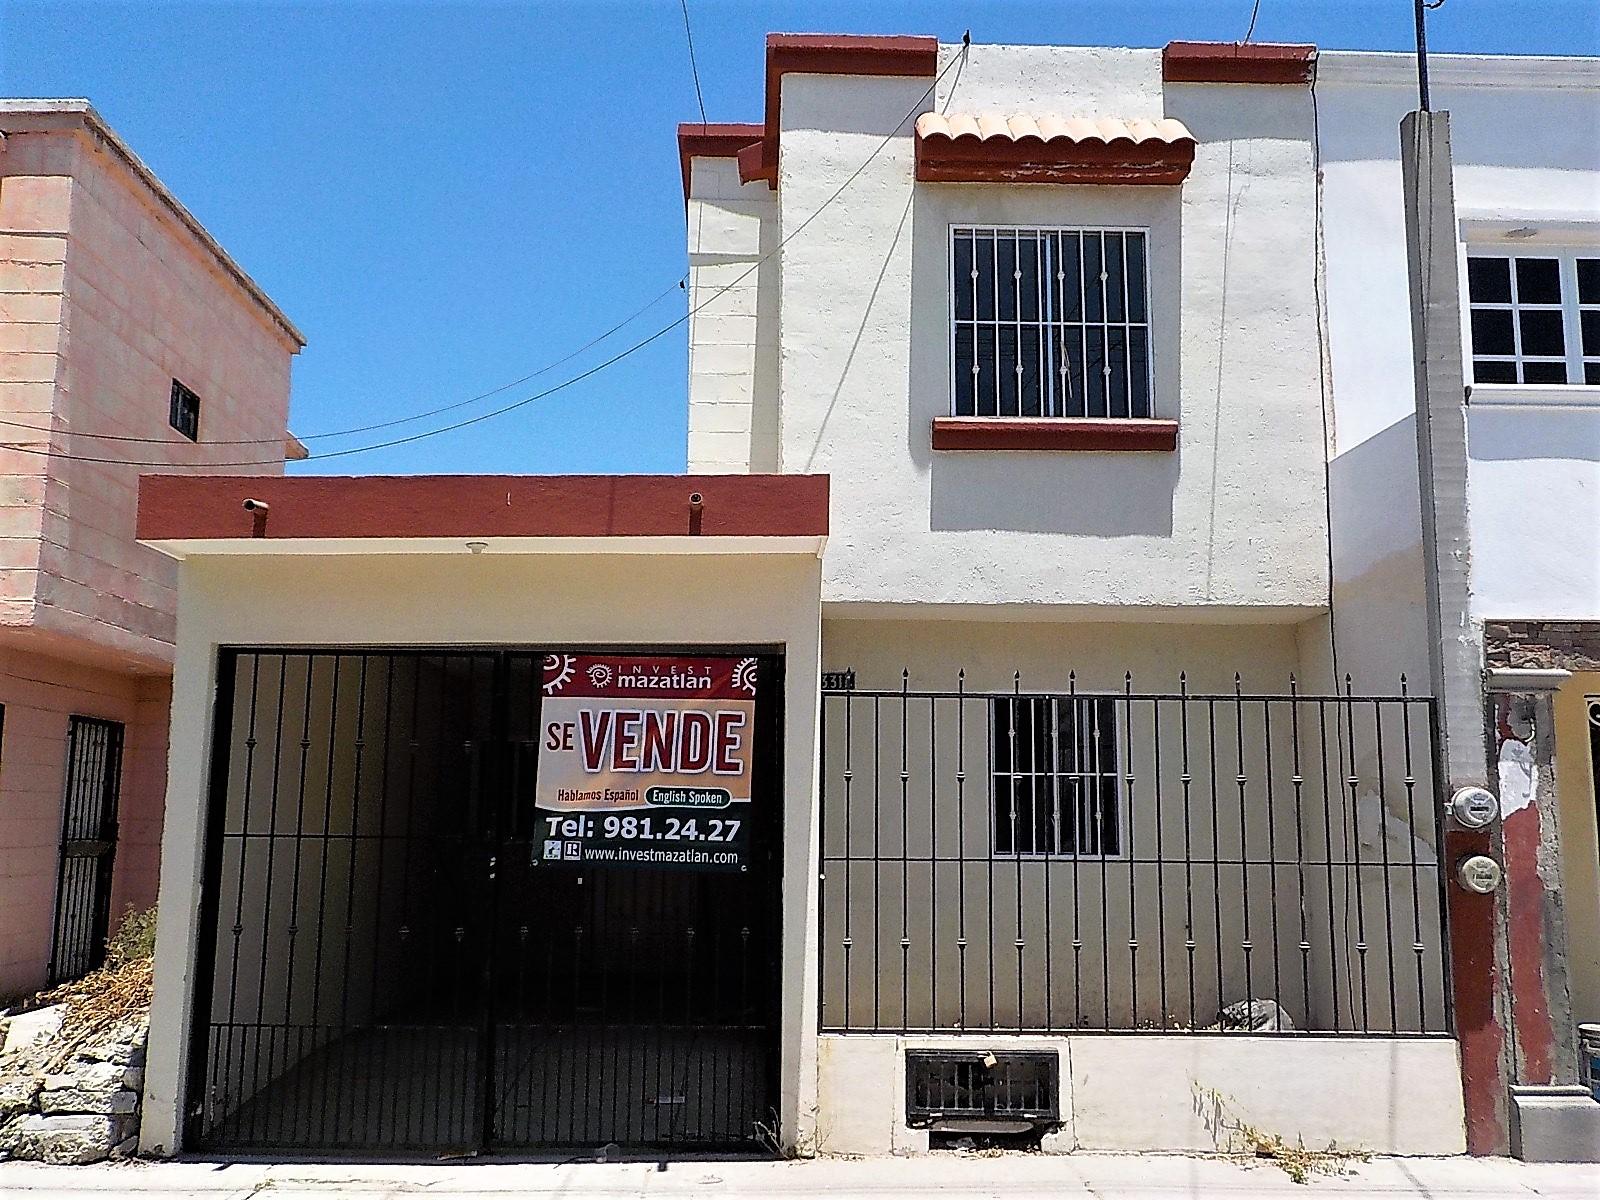 Bonita casa con recamara en la planta baja invest mazatl n for Casas planta baja bonitas